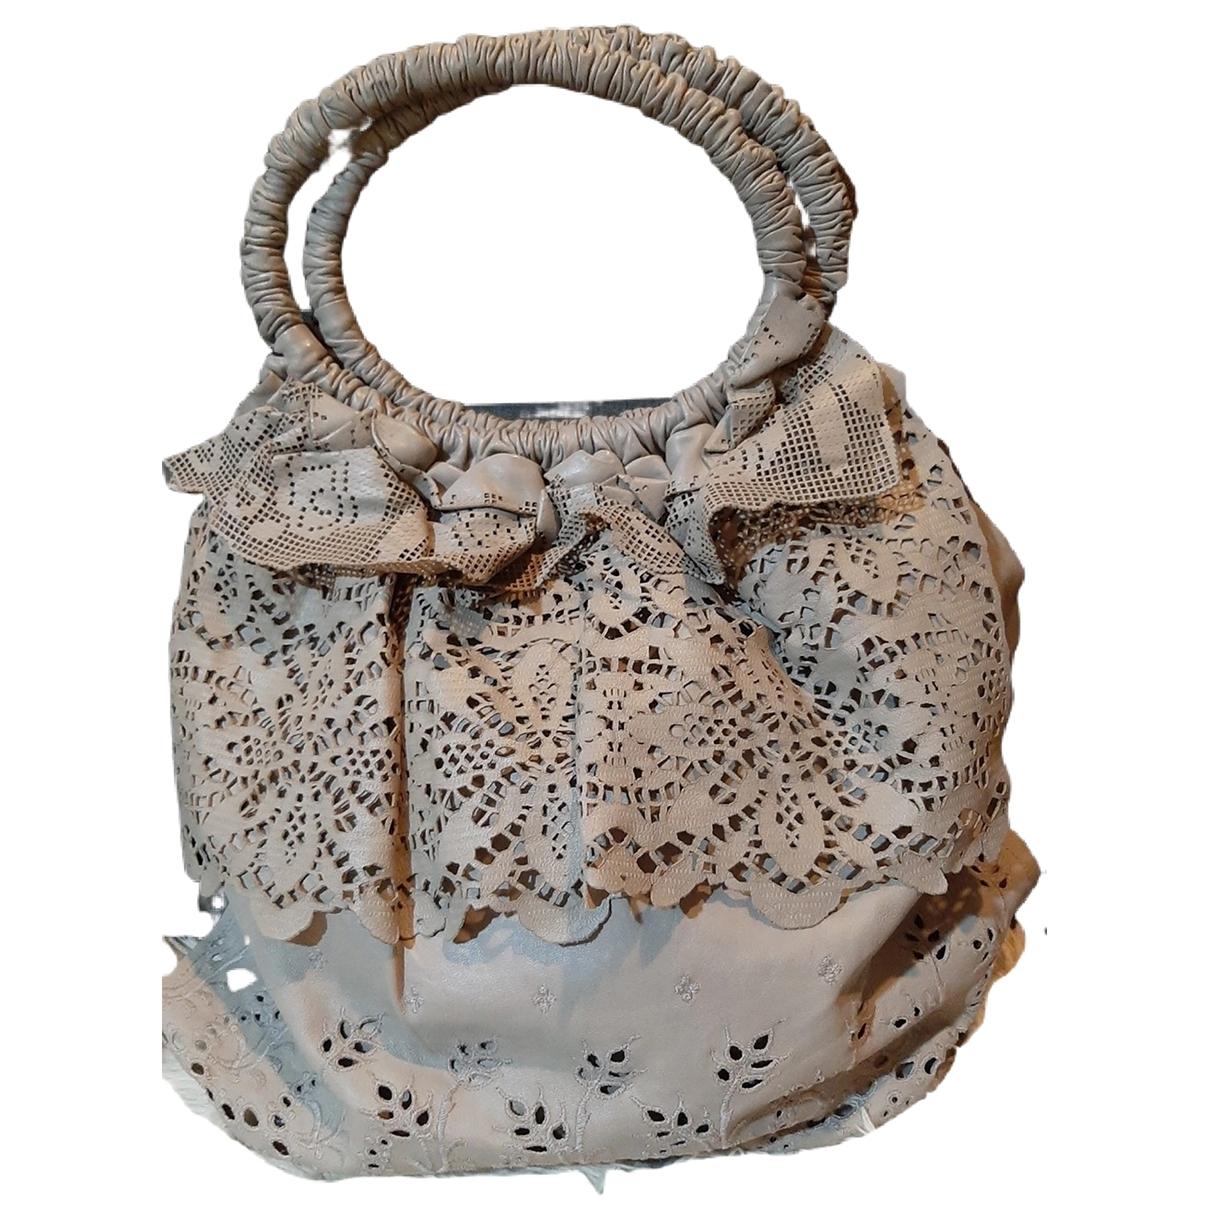 Valentino Garavani \N Grey Leather handbag for Women \N